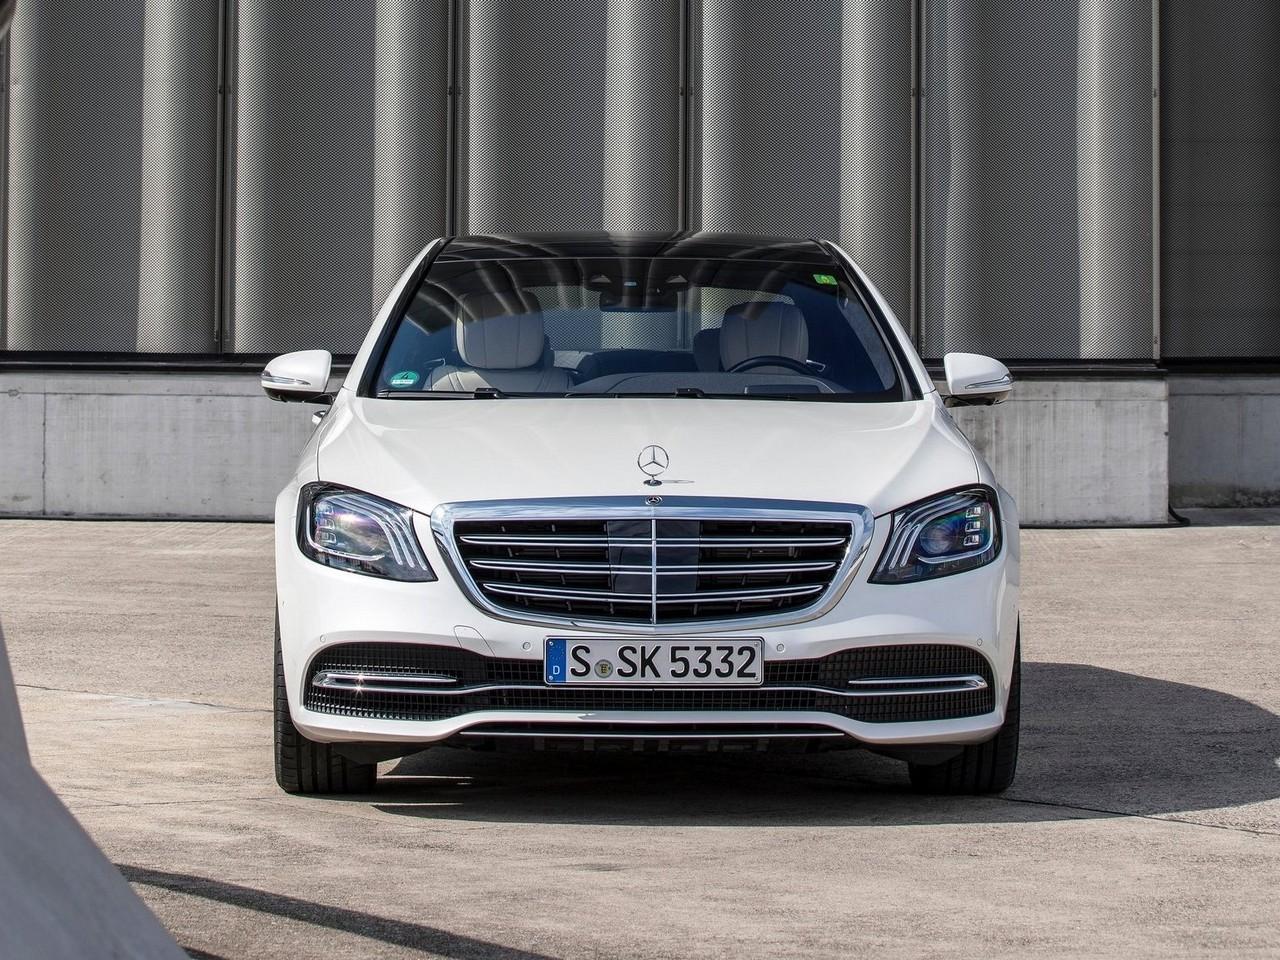 Mercedes Benz Classe S 2018 – Moteur V8 bi-turbo de 4,0 litres de 463 ch